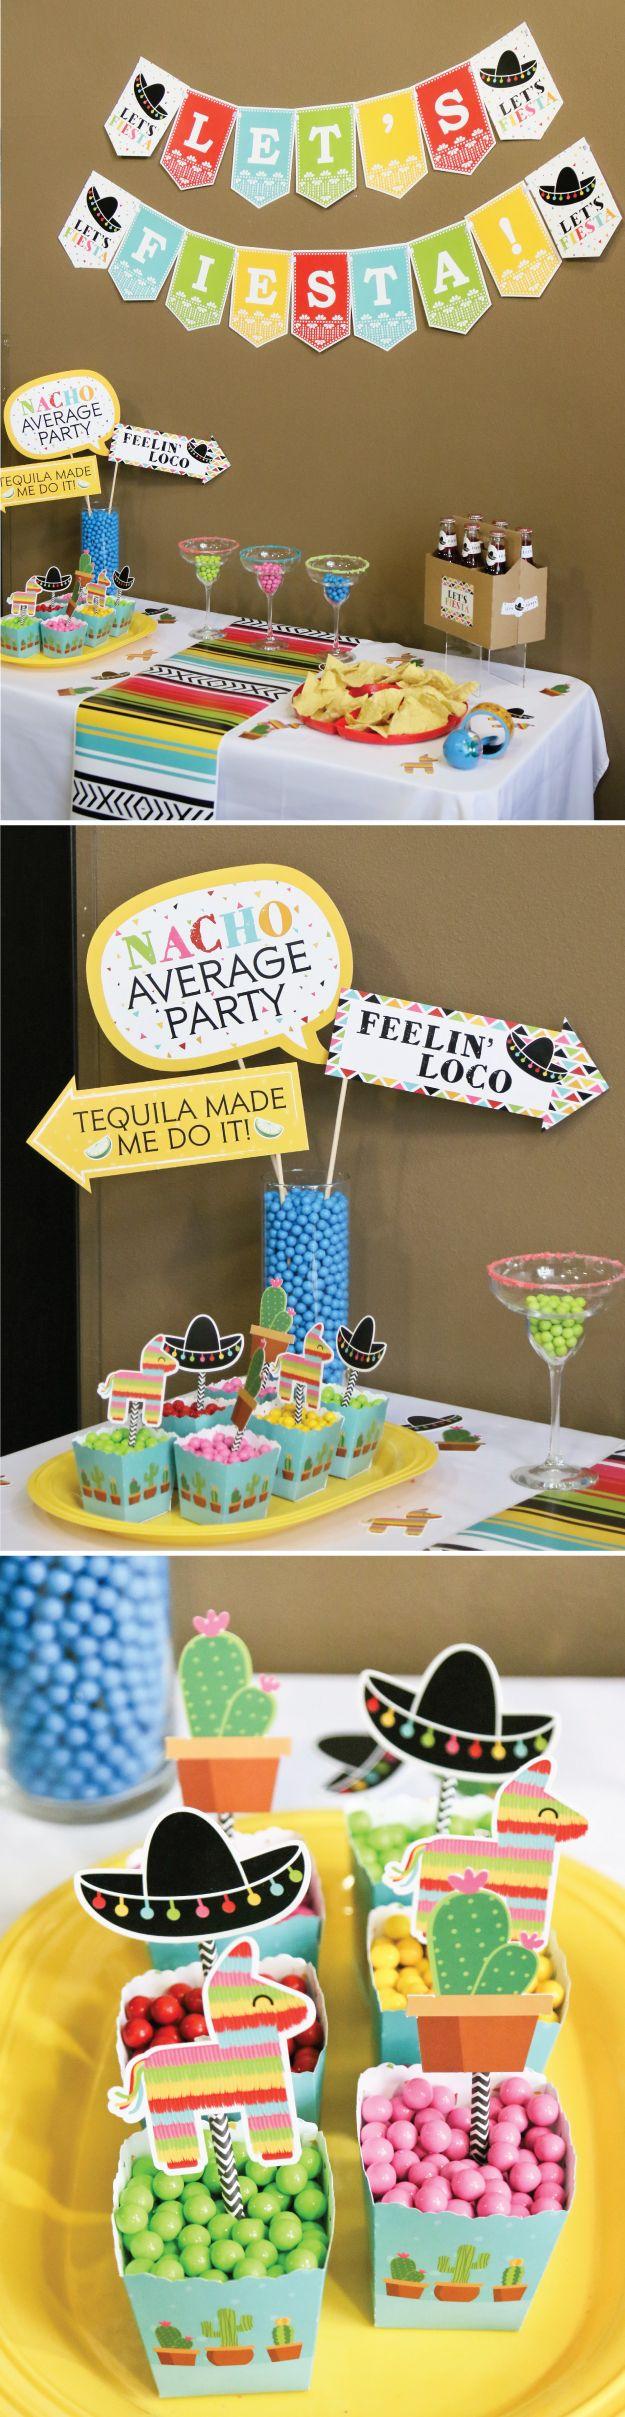 Office ideas for cinco de mayo - Mexican Fiesta For Cinco De Mayo May 5th Party Ideas